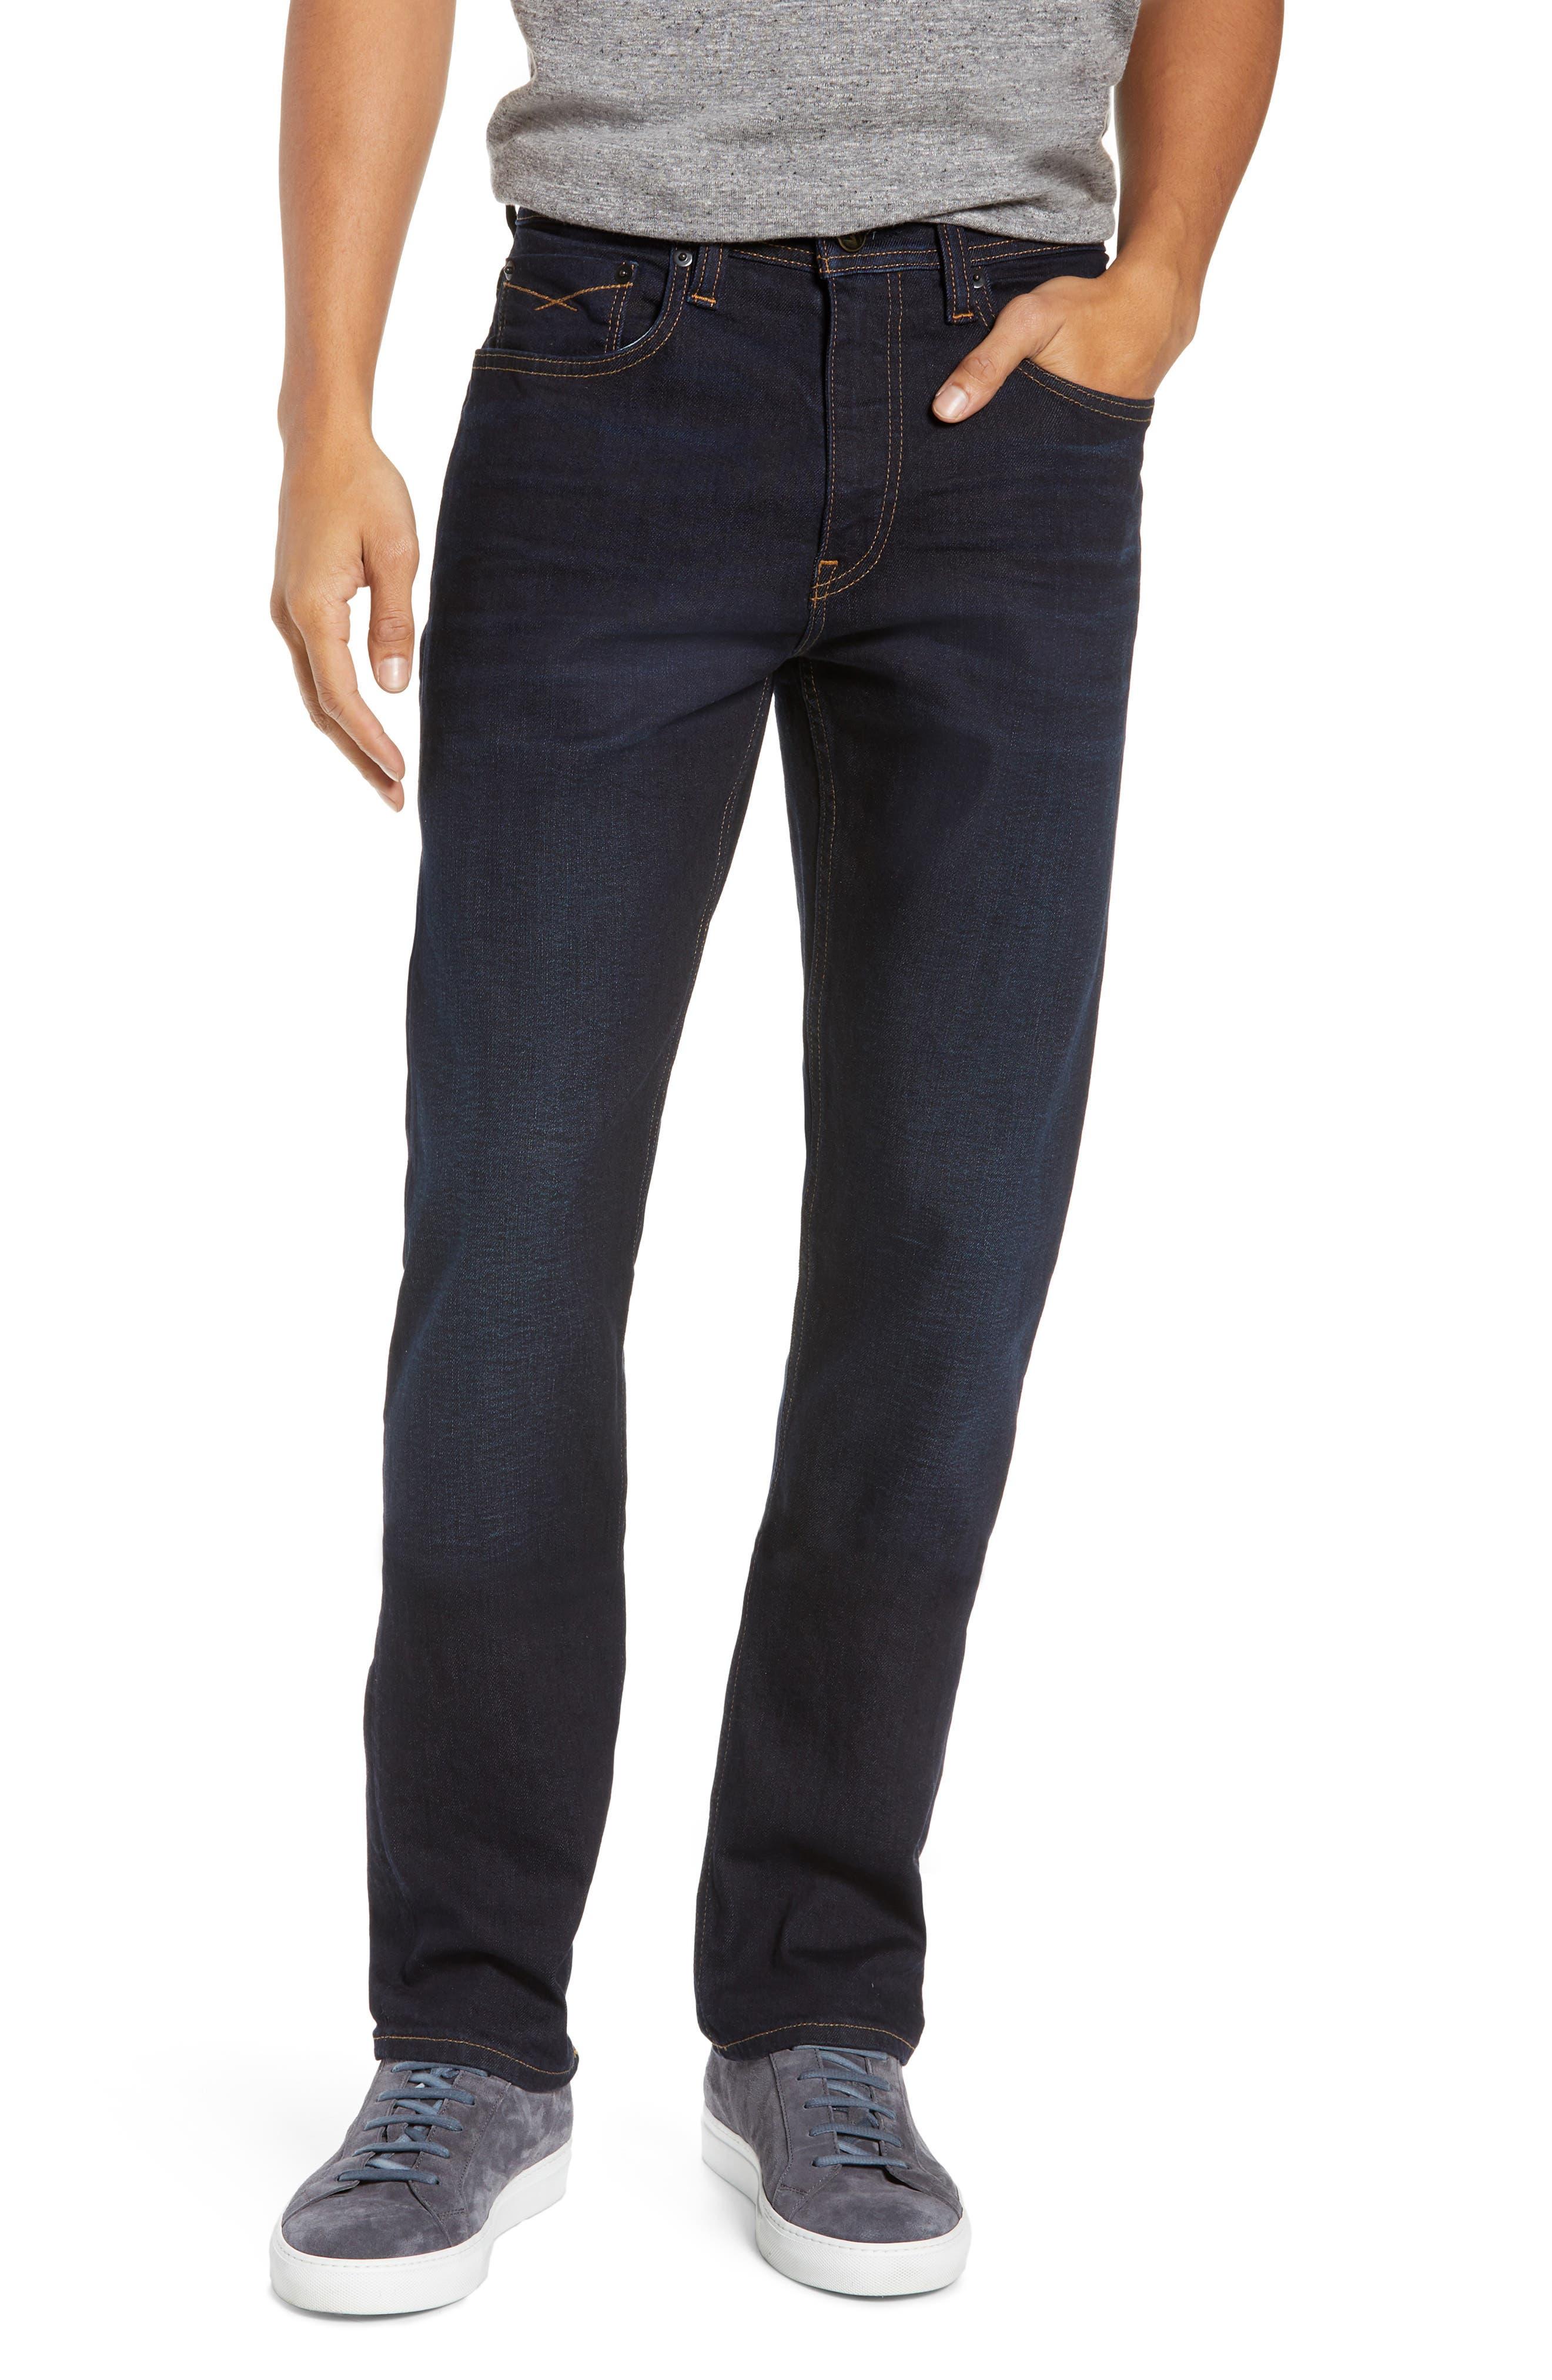 REVTOWN, Sharp Slim Fit Jeans, Main thumbnail 1, color, DARK INDIGO